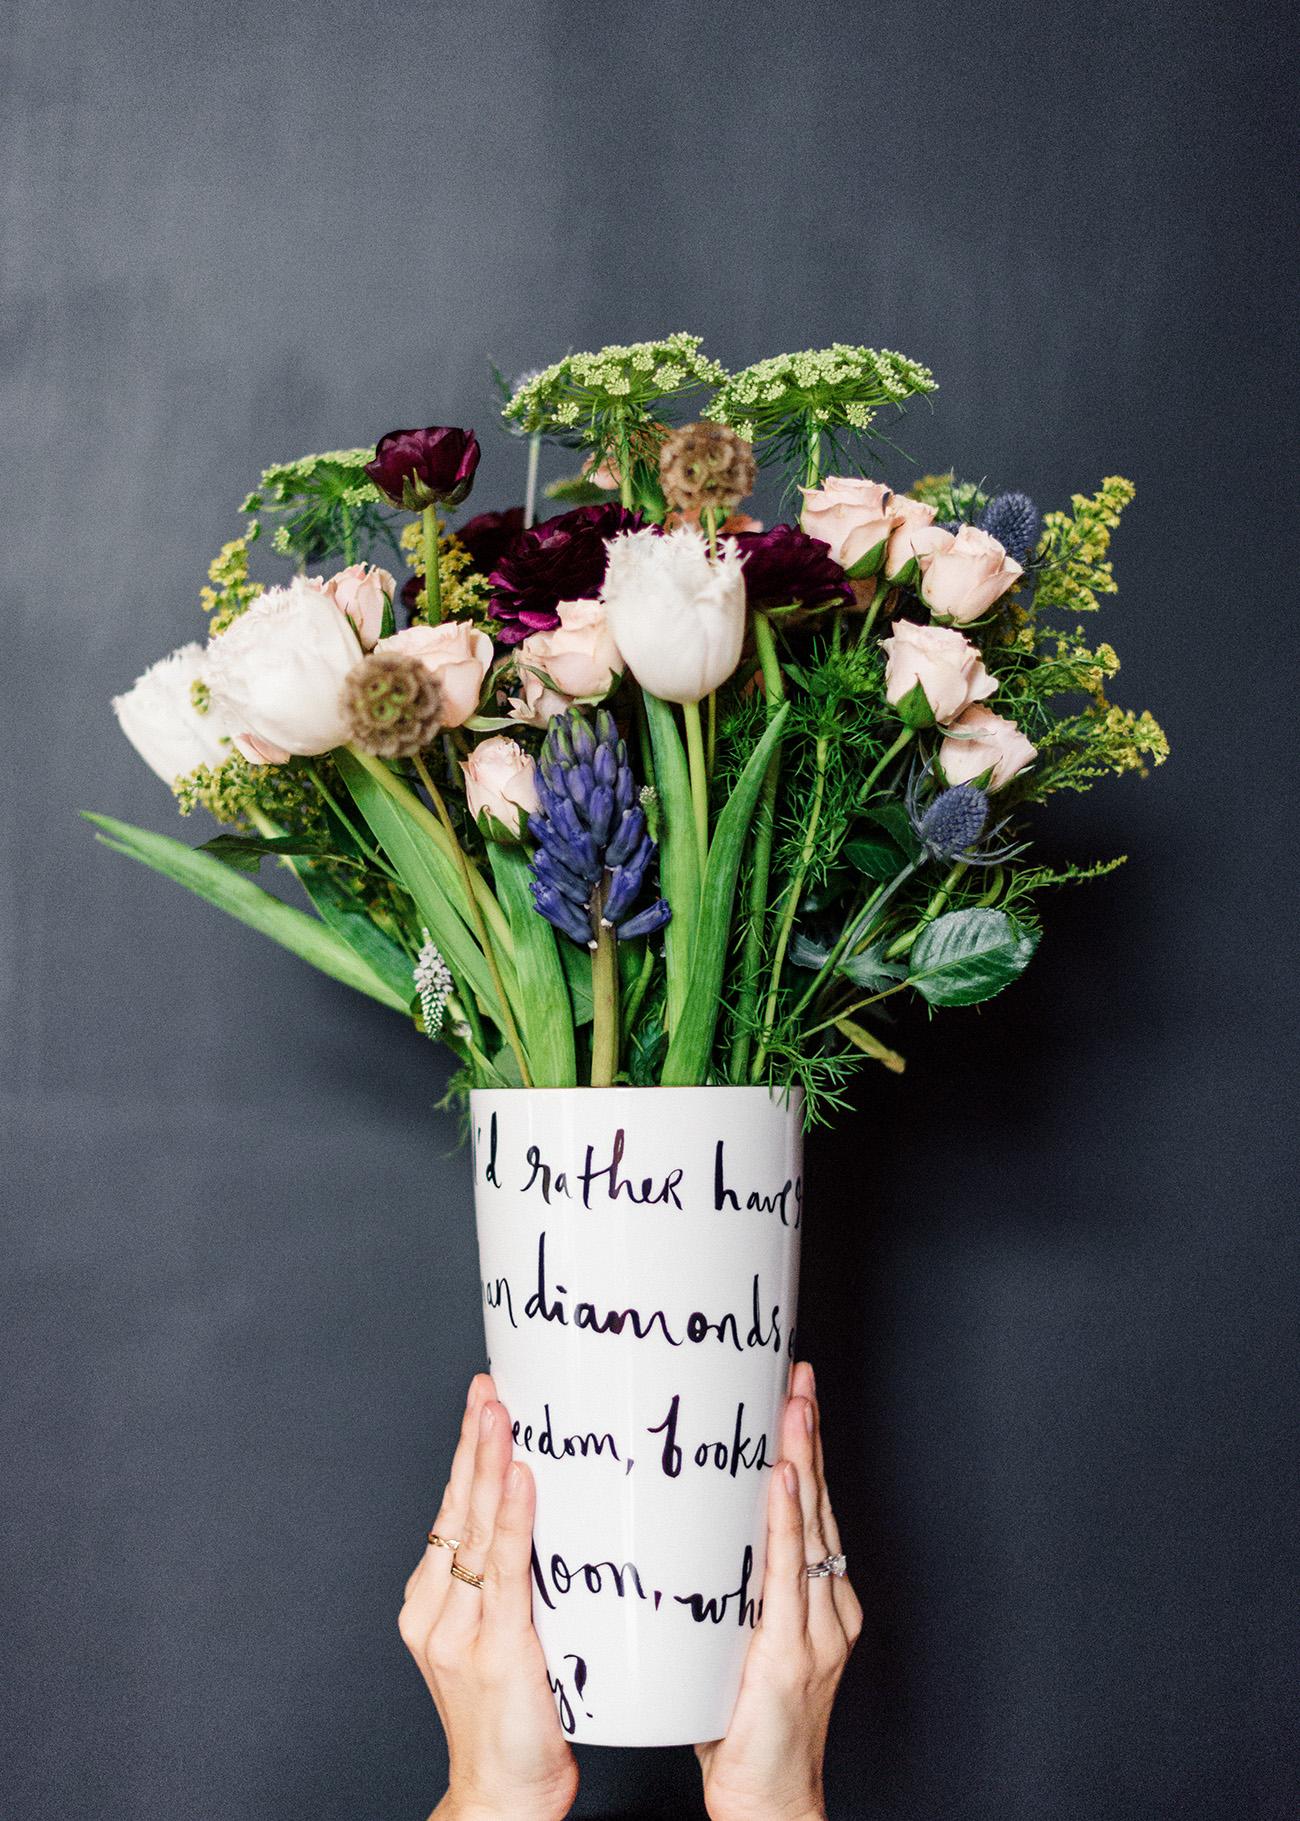 Kate Spade vase from Bed Bath & Beyond